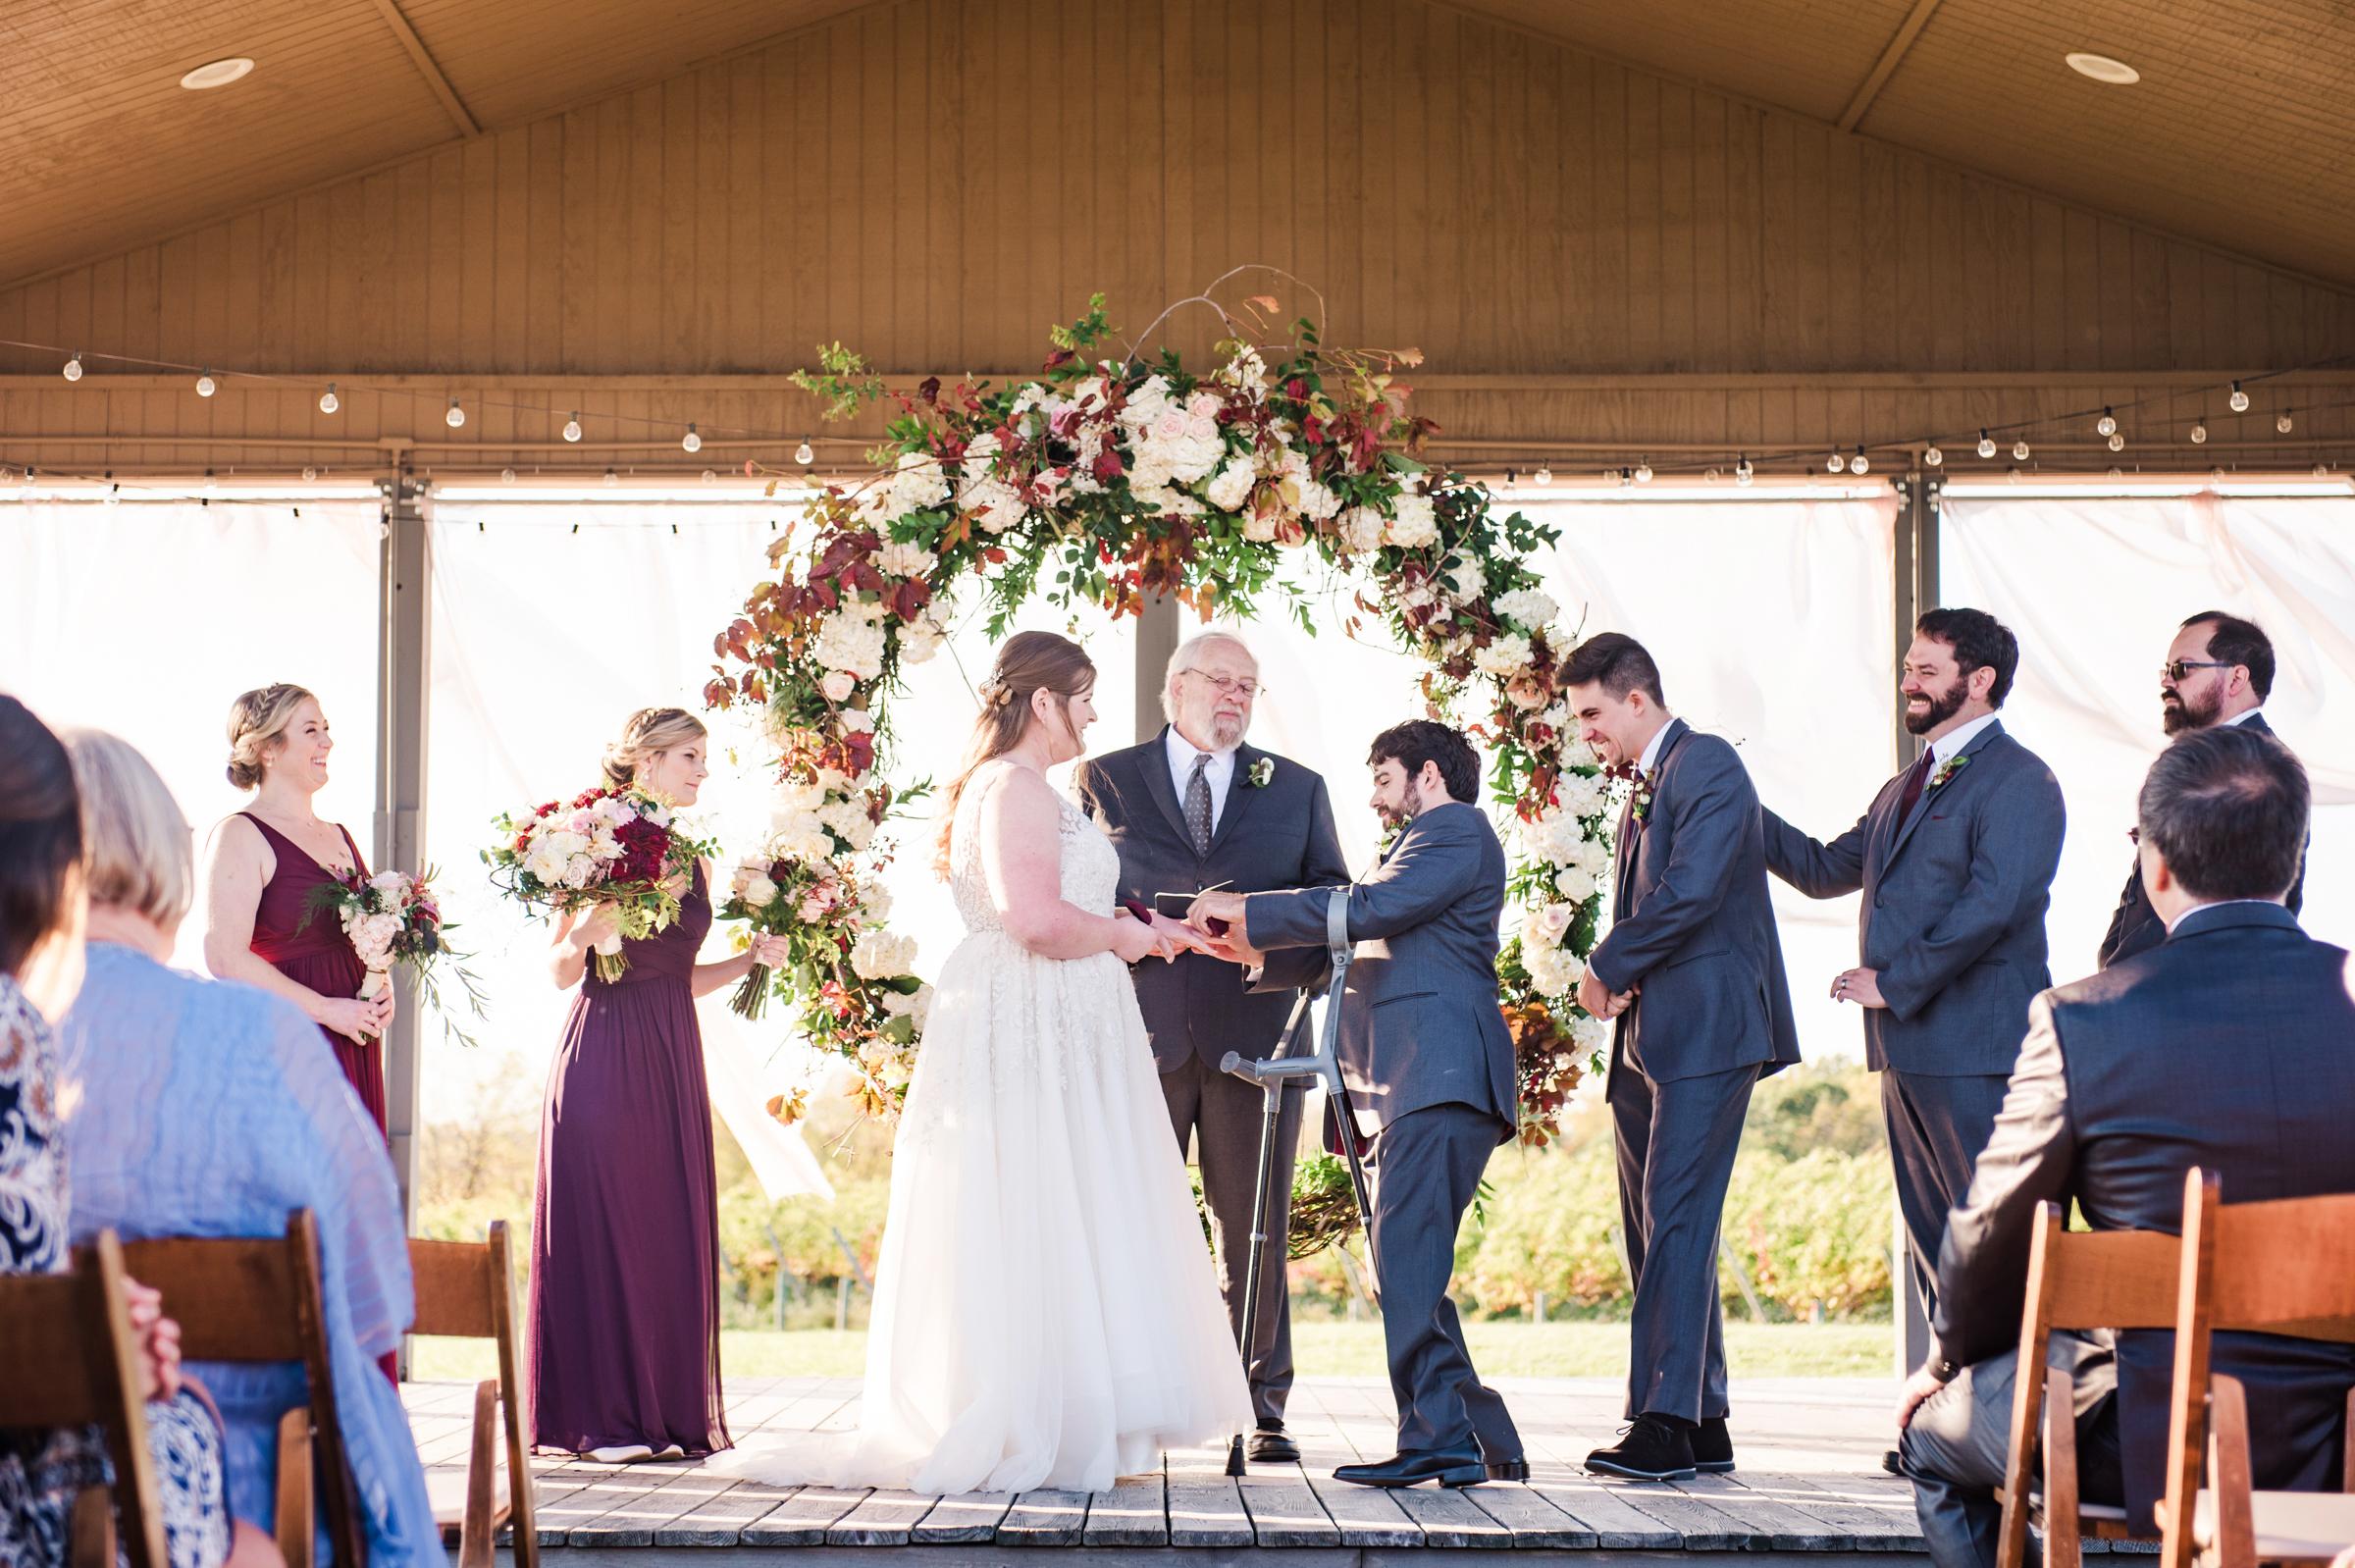 Zugibe_Vineyards_Finger_Lakes_Wedding_JILL_STUDIO_Rochester_NY_Photographer_DSC_4001.jpg